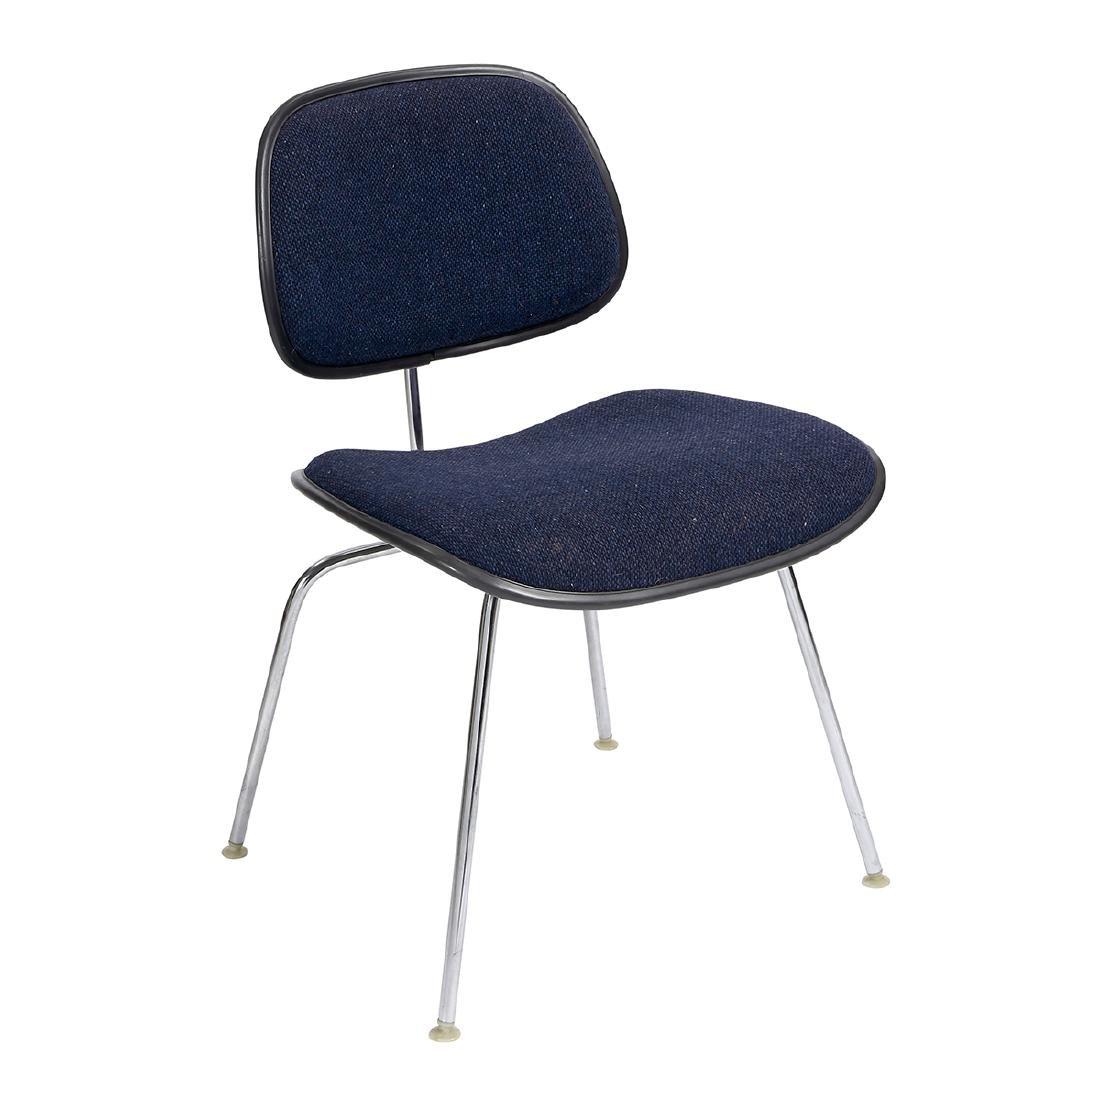 Eames for Herman Miller upholstered chair